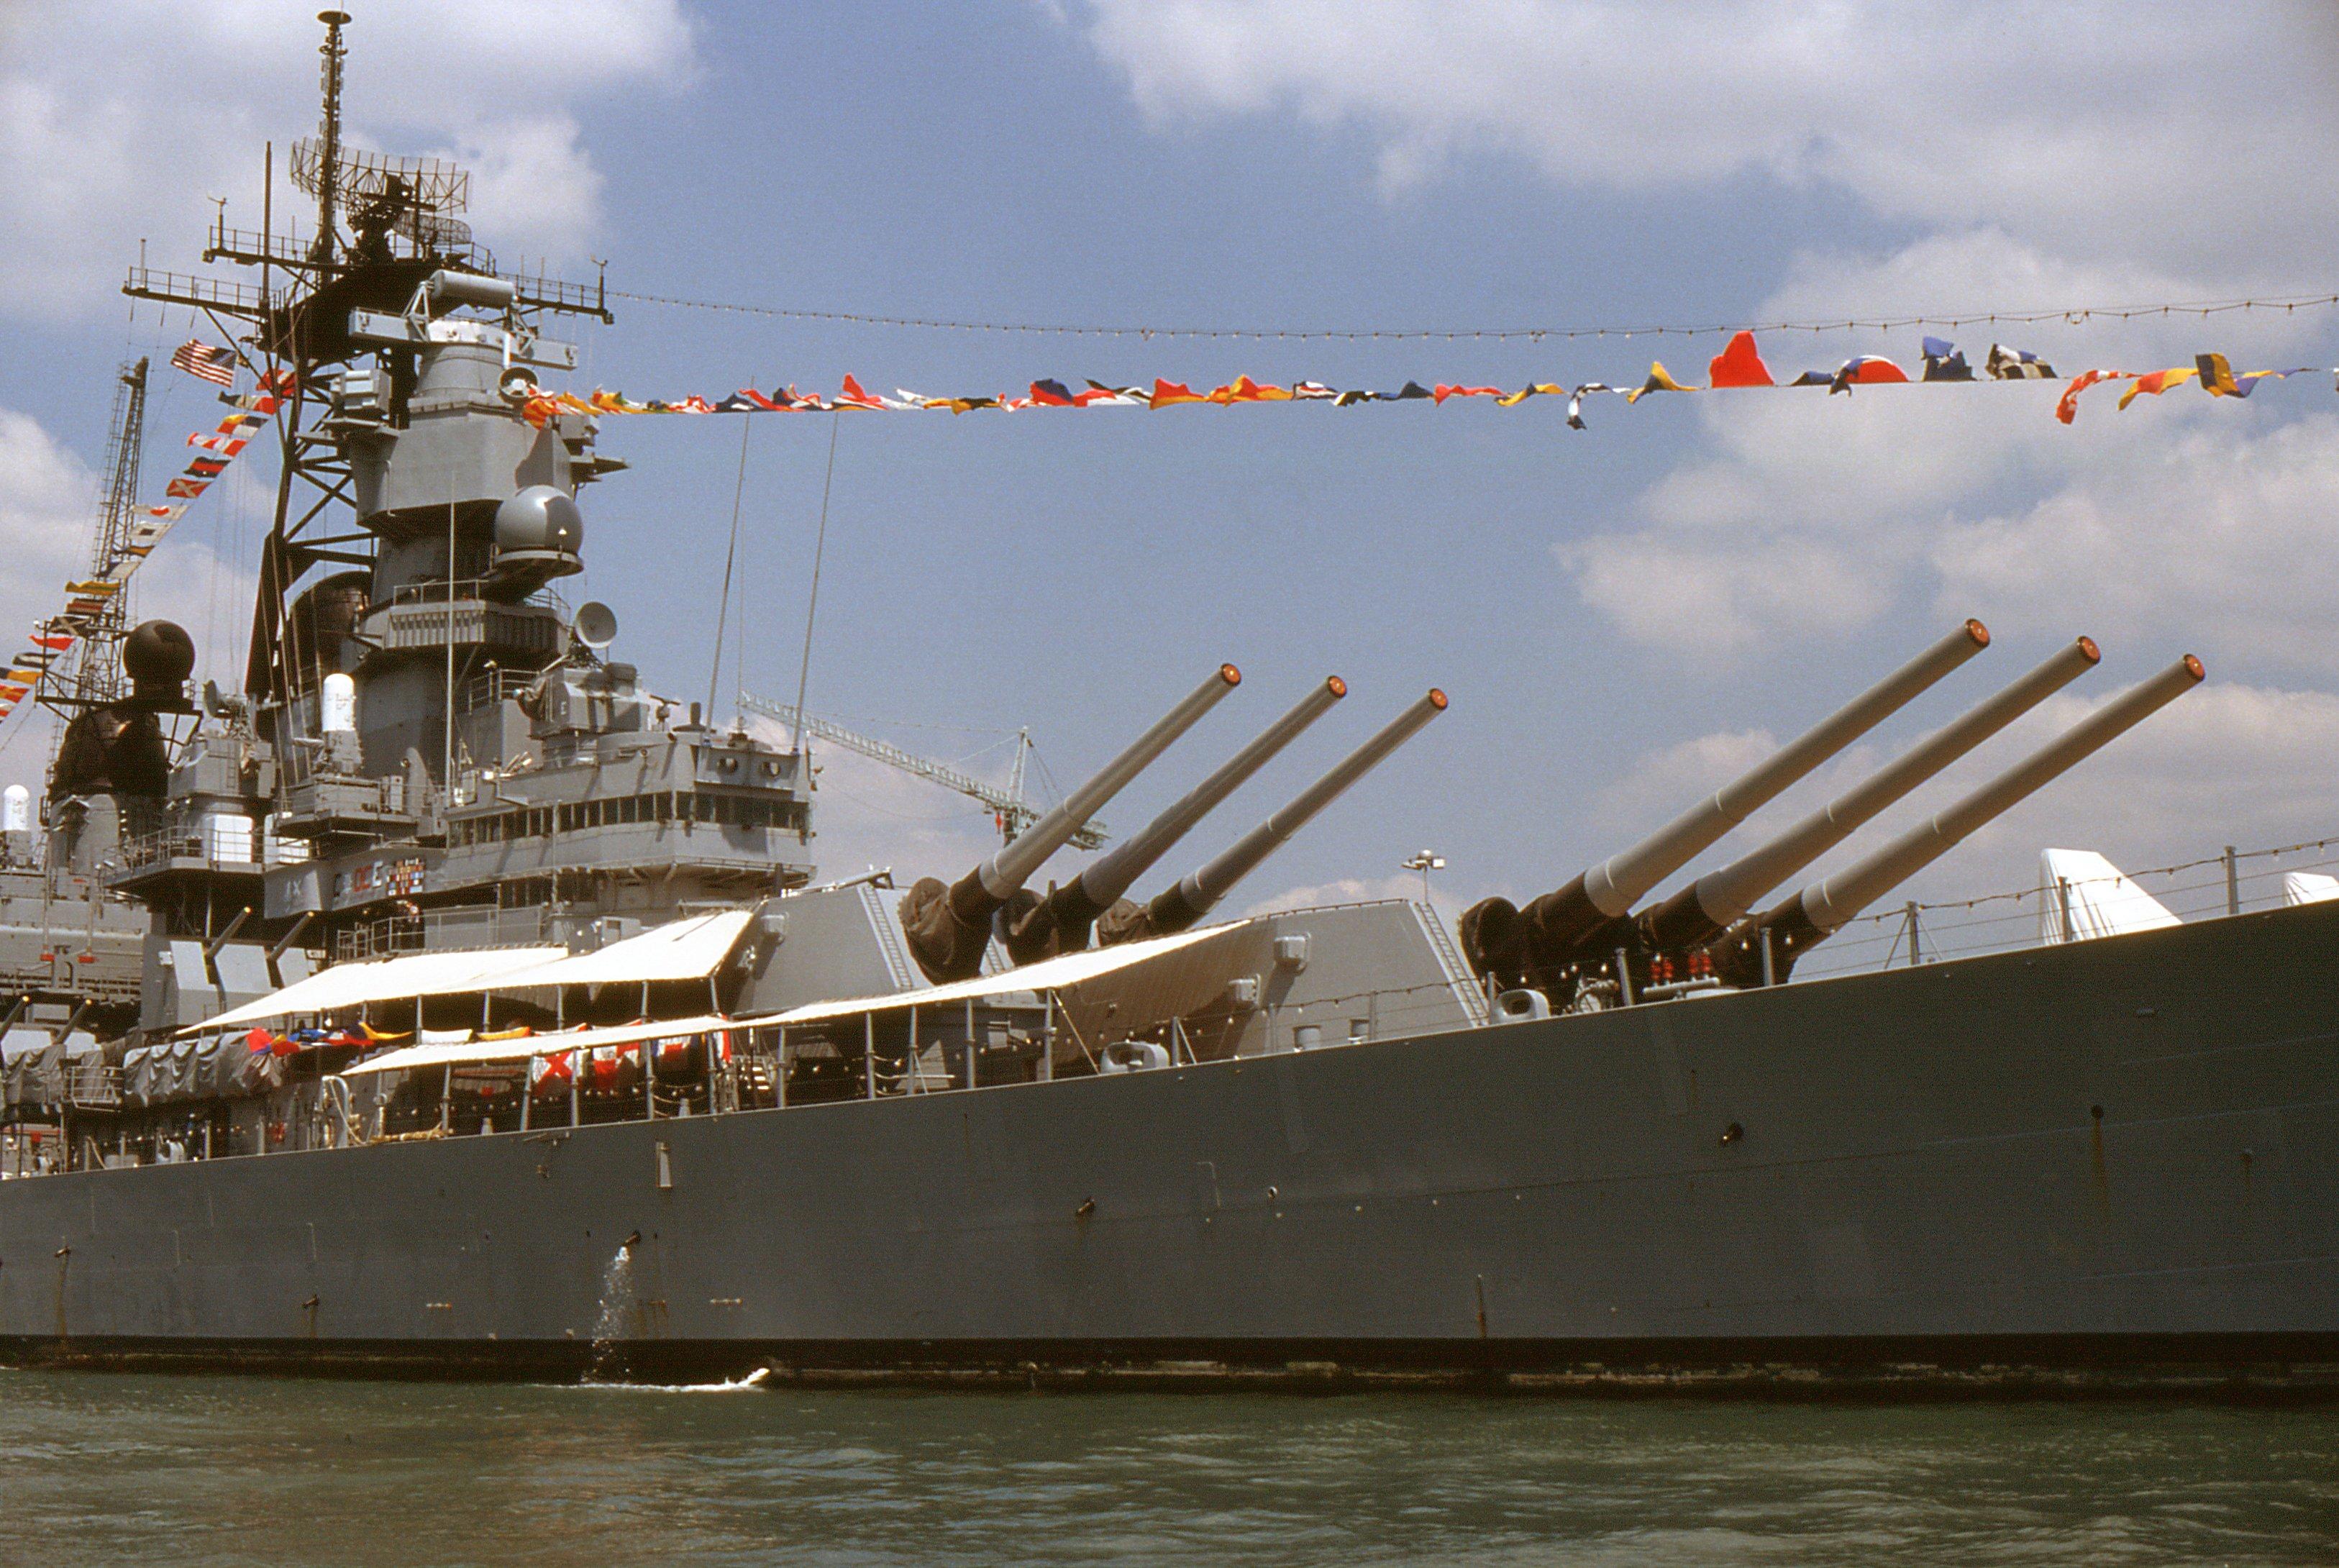 File:USS Iowa, Portsmouth, Great Britain, July 1989 (3) jpg